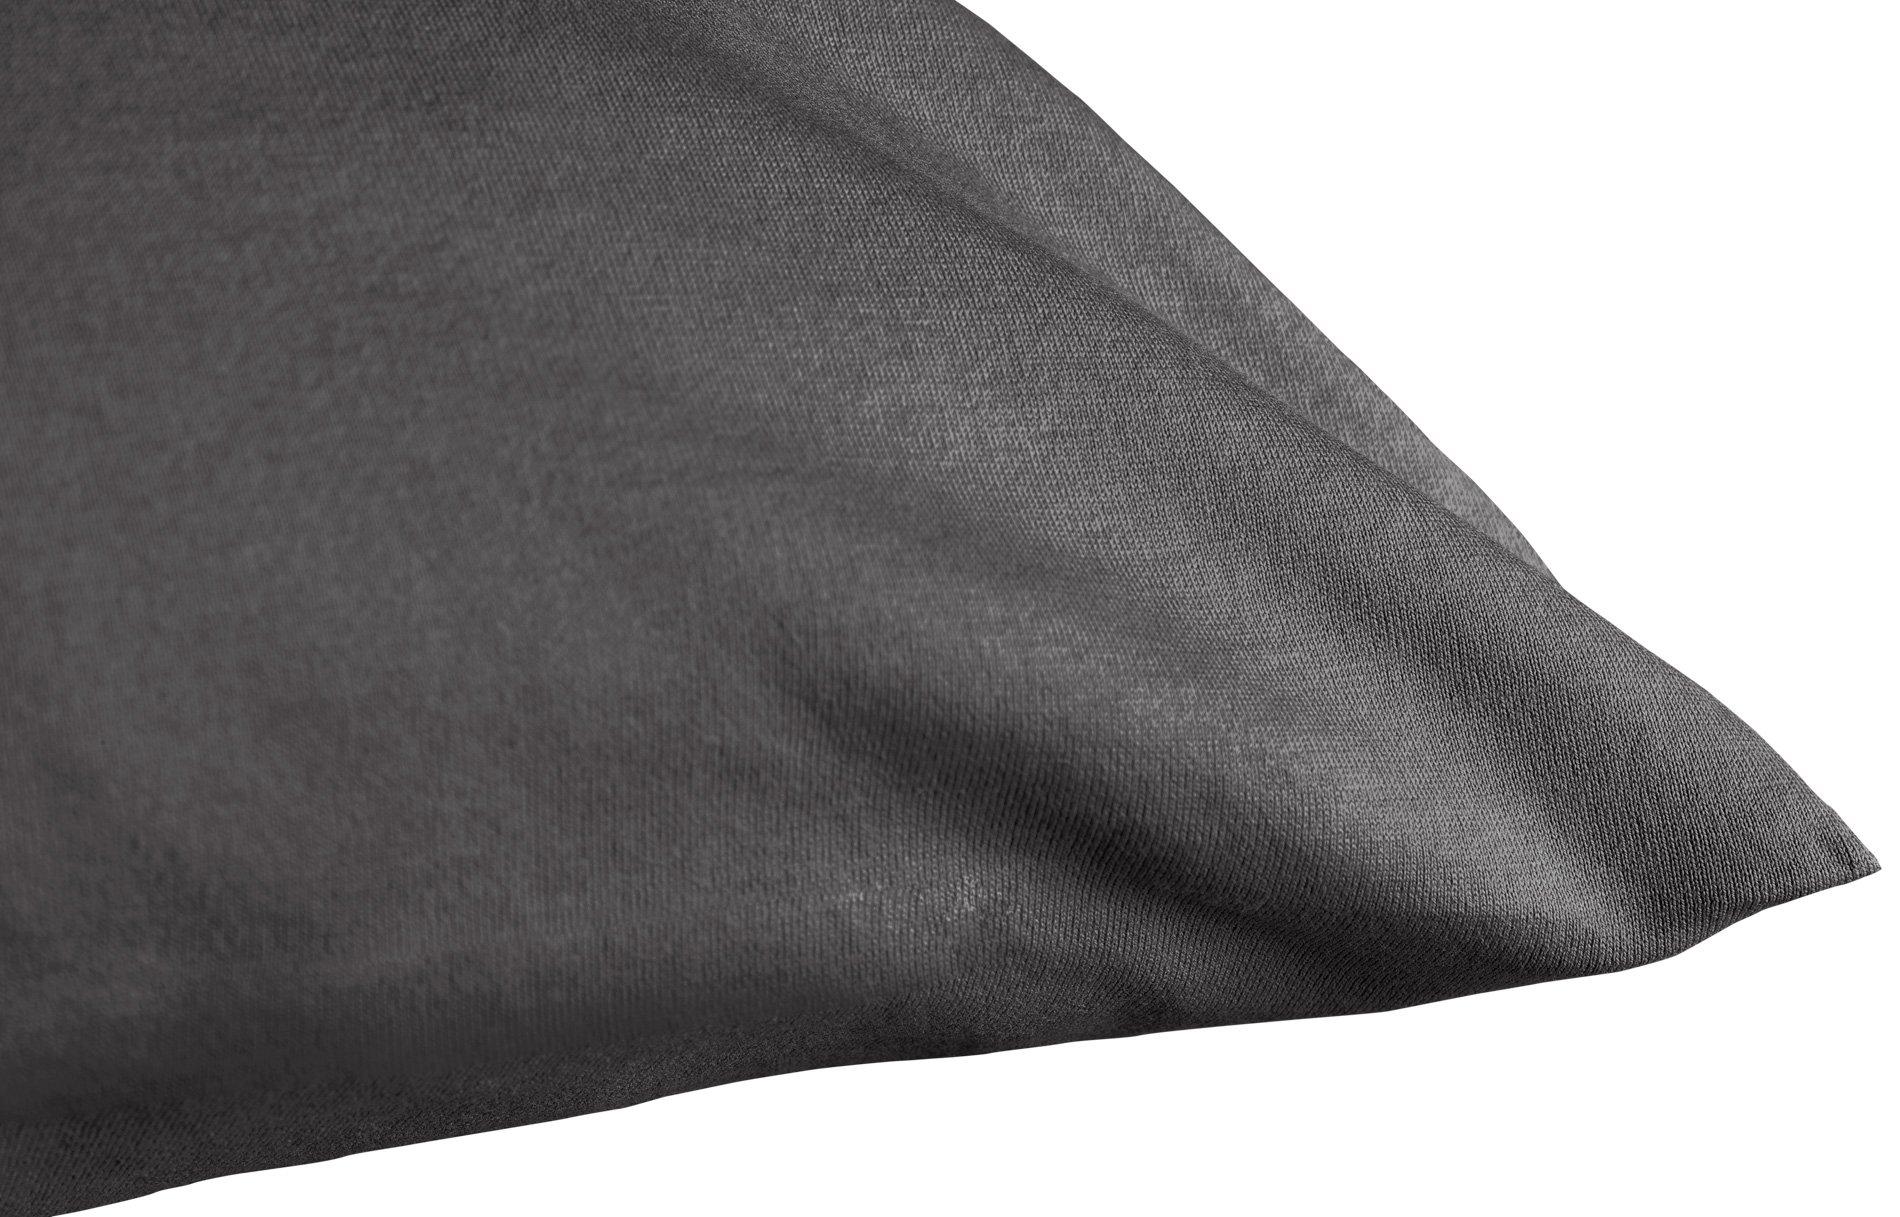 Edel-Zwirn-Jersey schiefer B40cm